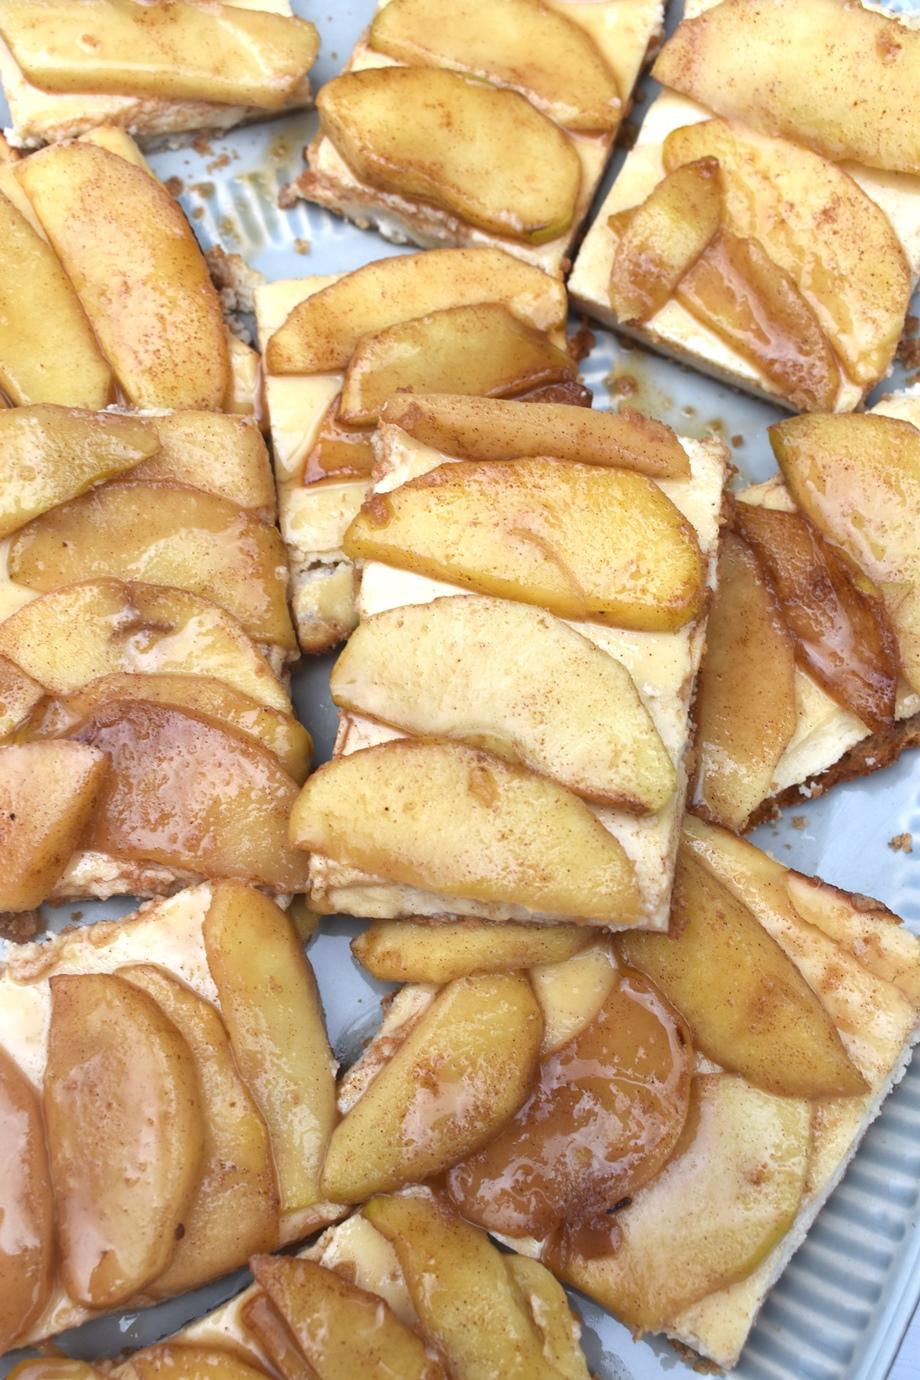 lots of caramel apple cheesecake bars